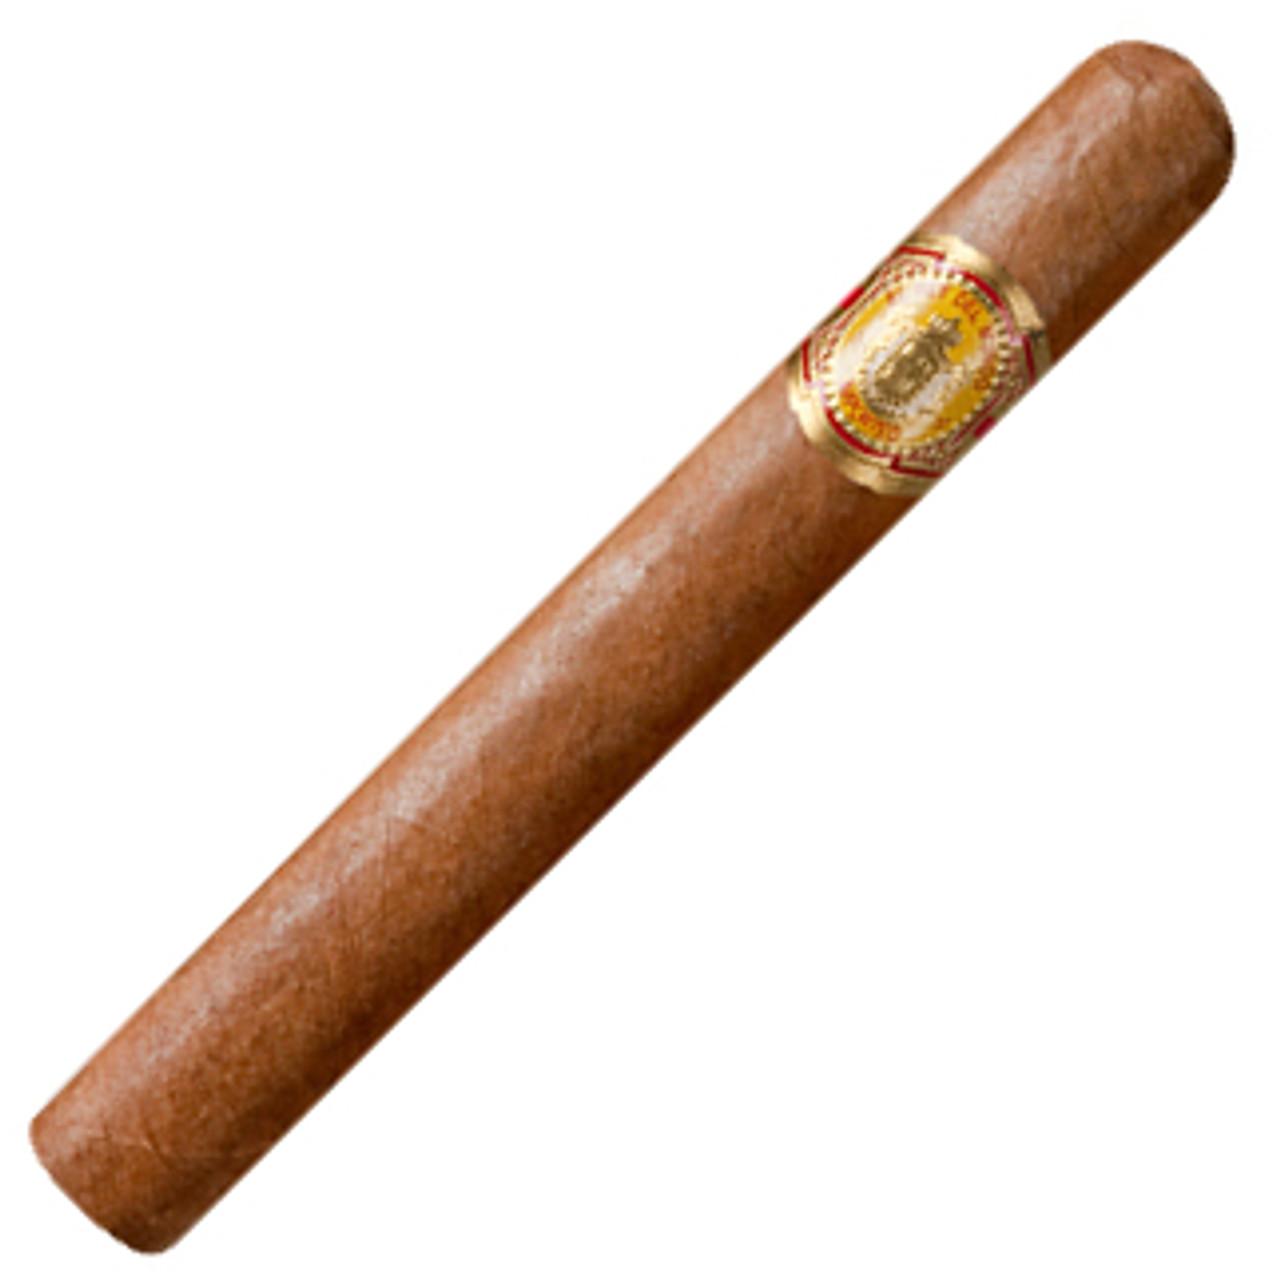 El Rey del Mundo Corona Cigars - 5.62 x 45 (Box of 20)